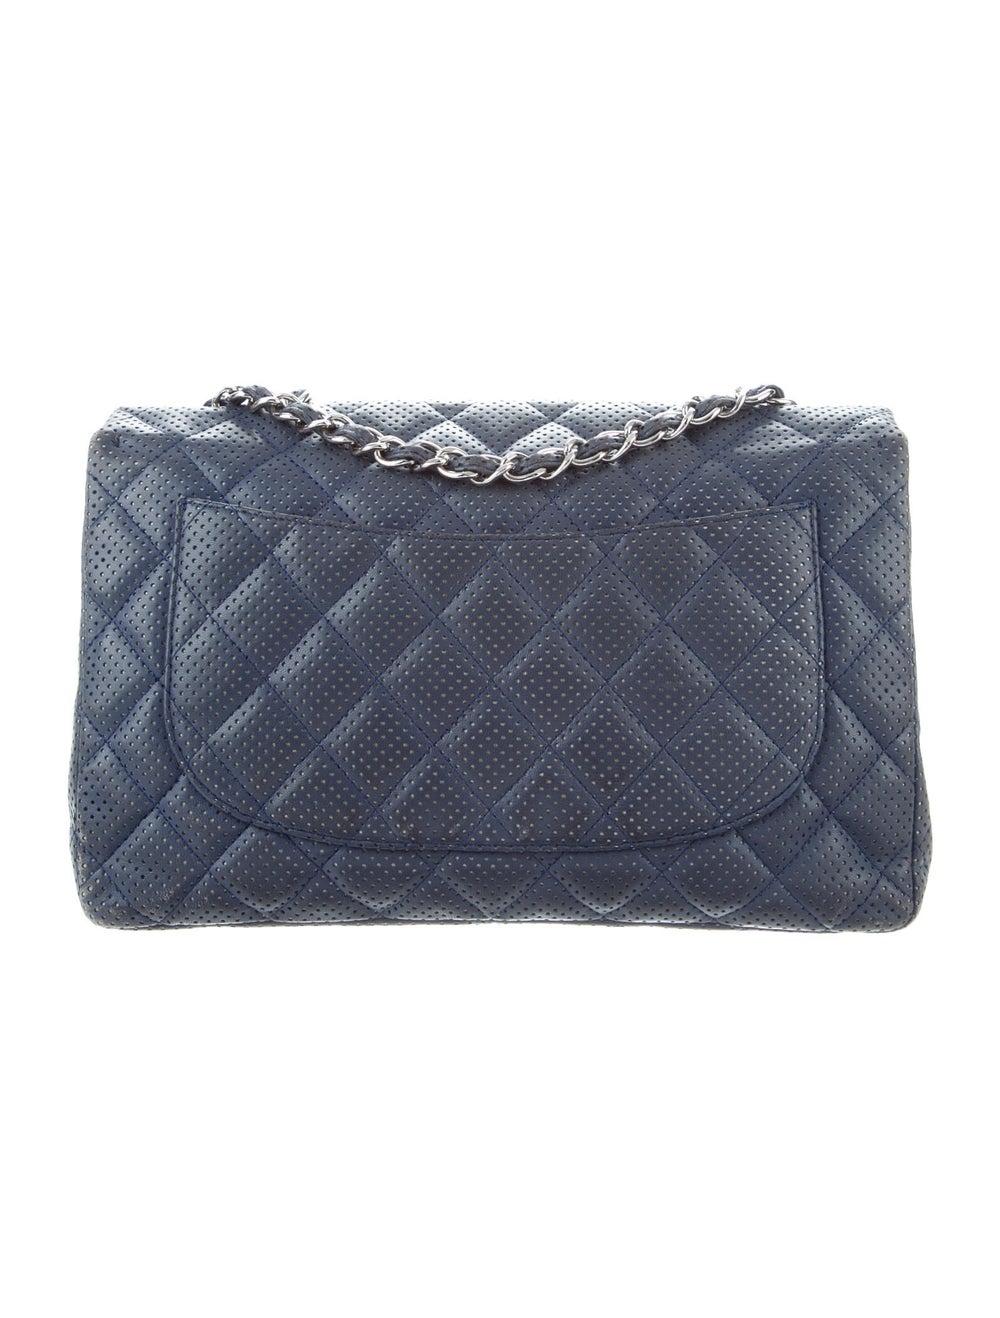 Chanel Perforated Classic Jumbo Single Flap Bag B… - image 4